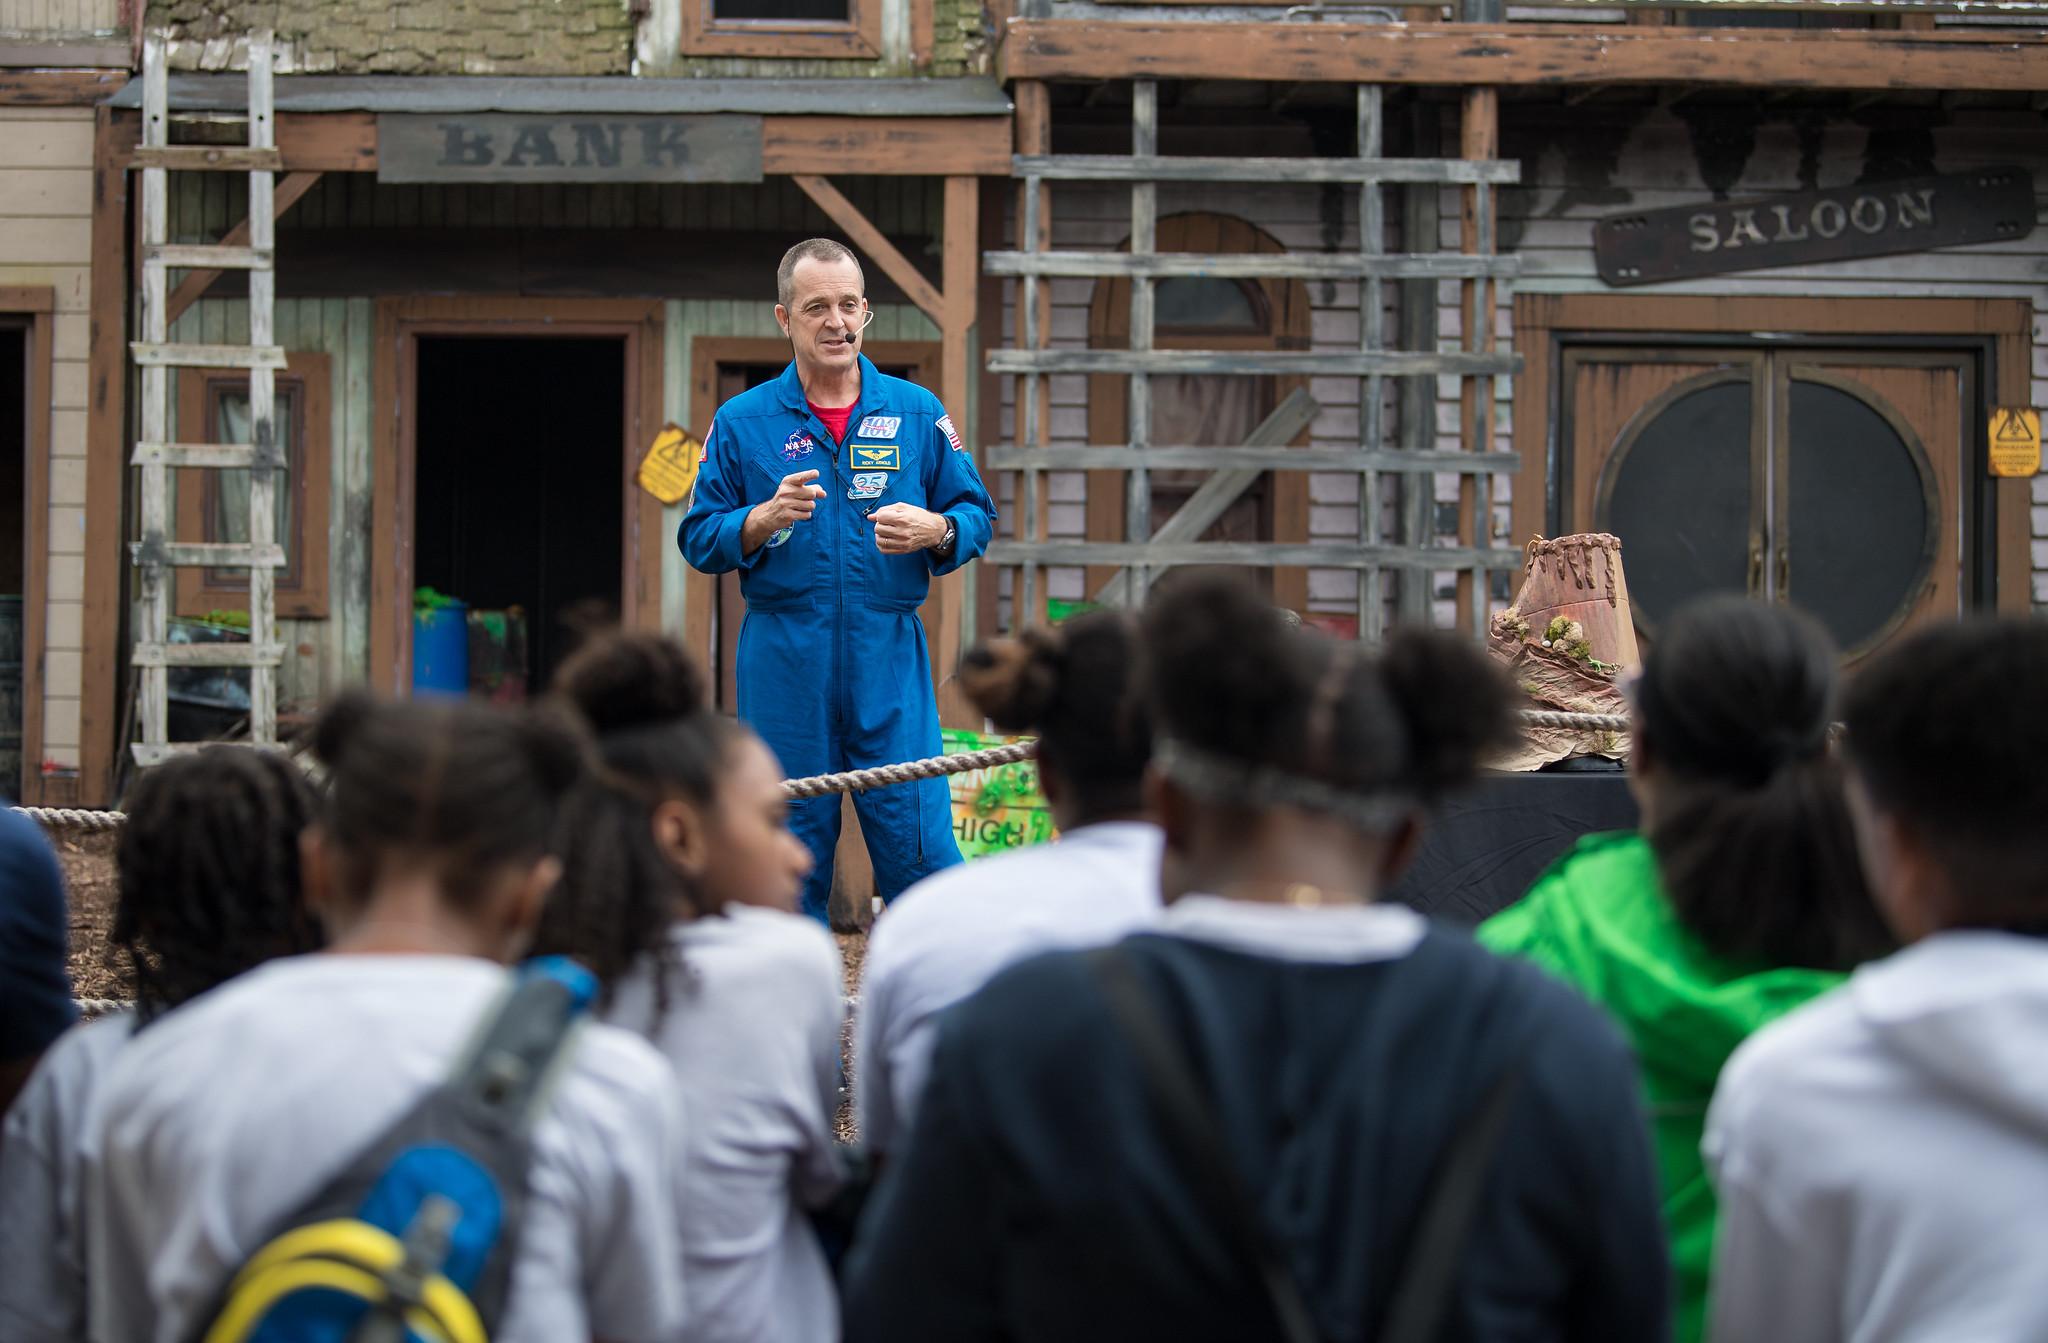 Astronaut Ricky Arnold Talks STEM Education